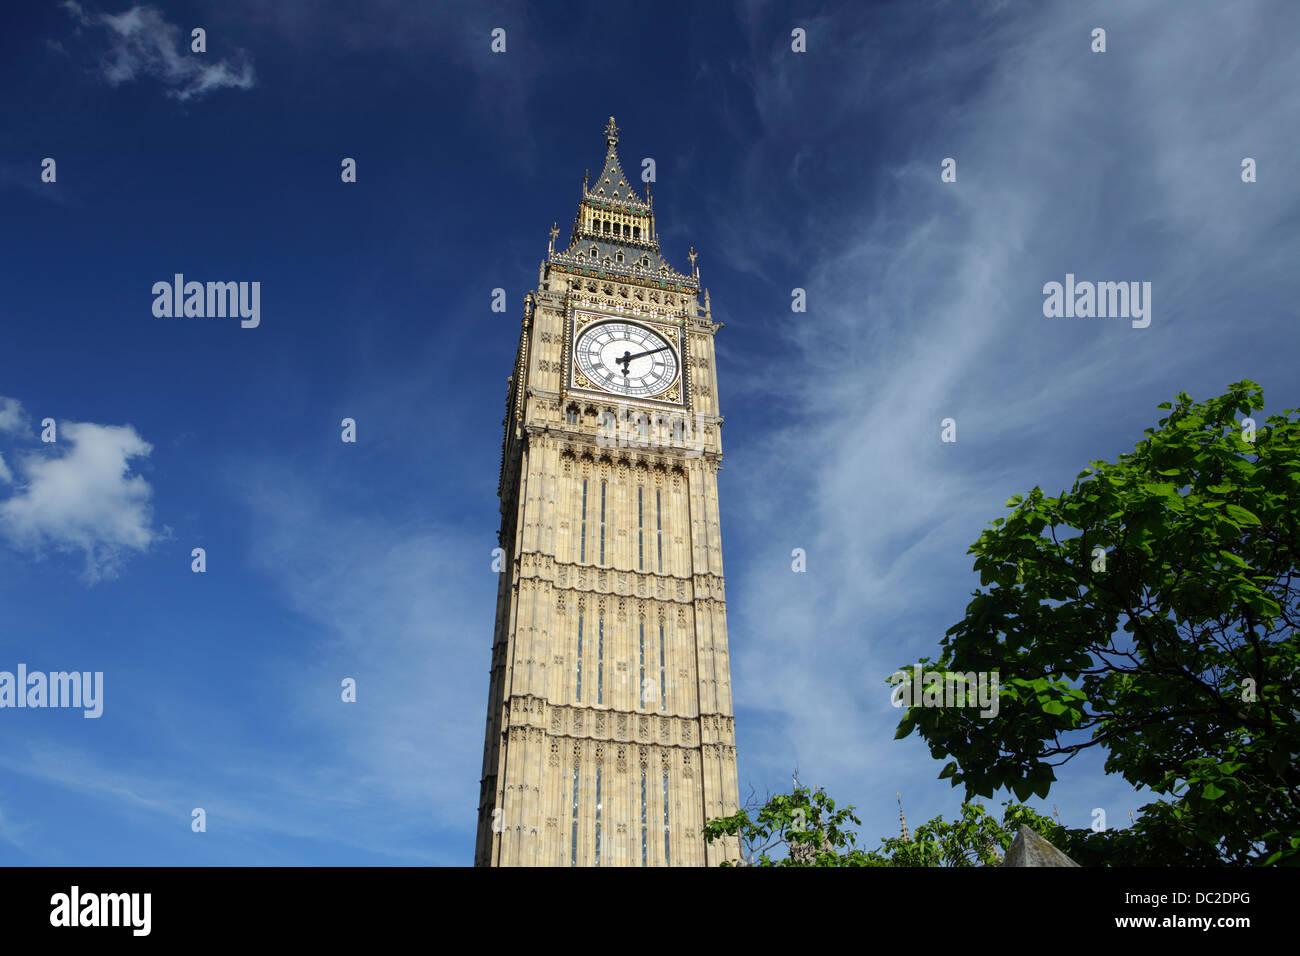 Elizabeth Tower or Big Ben, London, UK - Stock Image